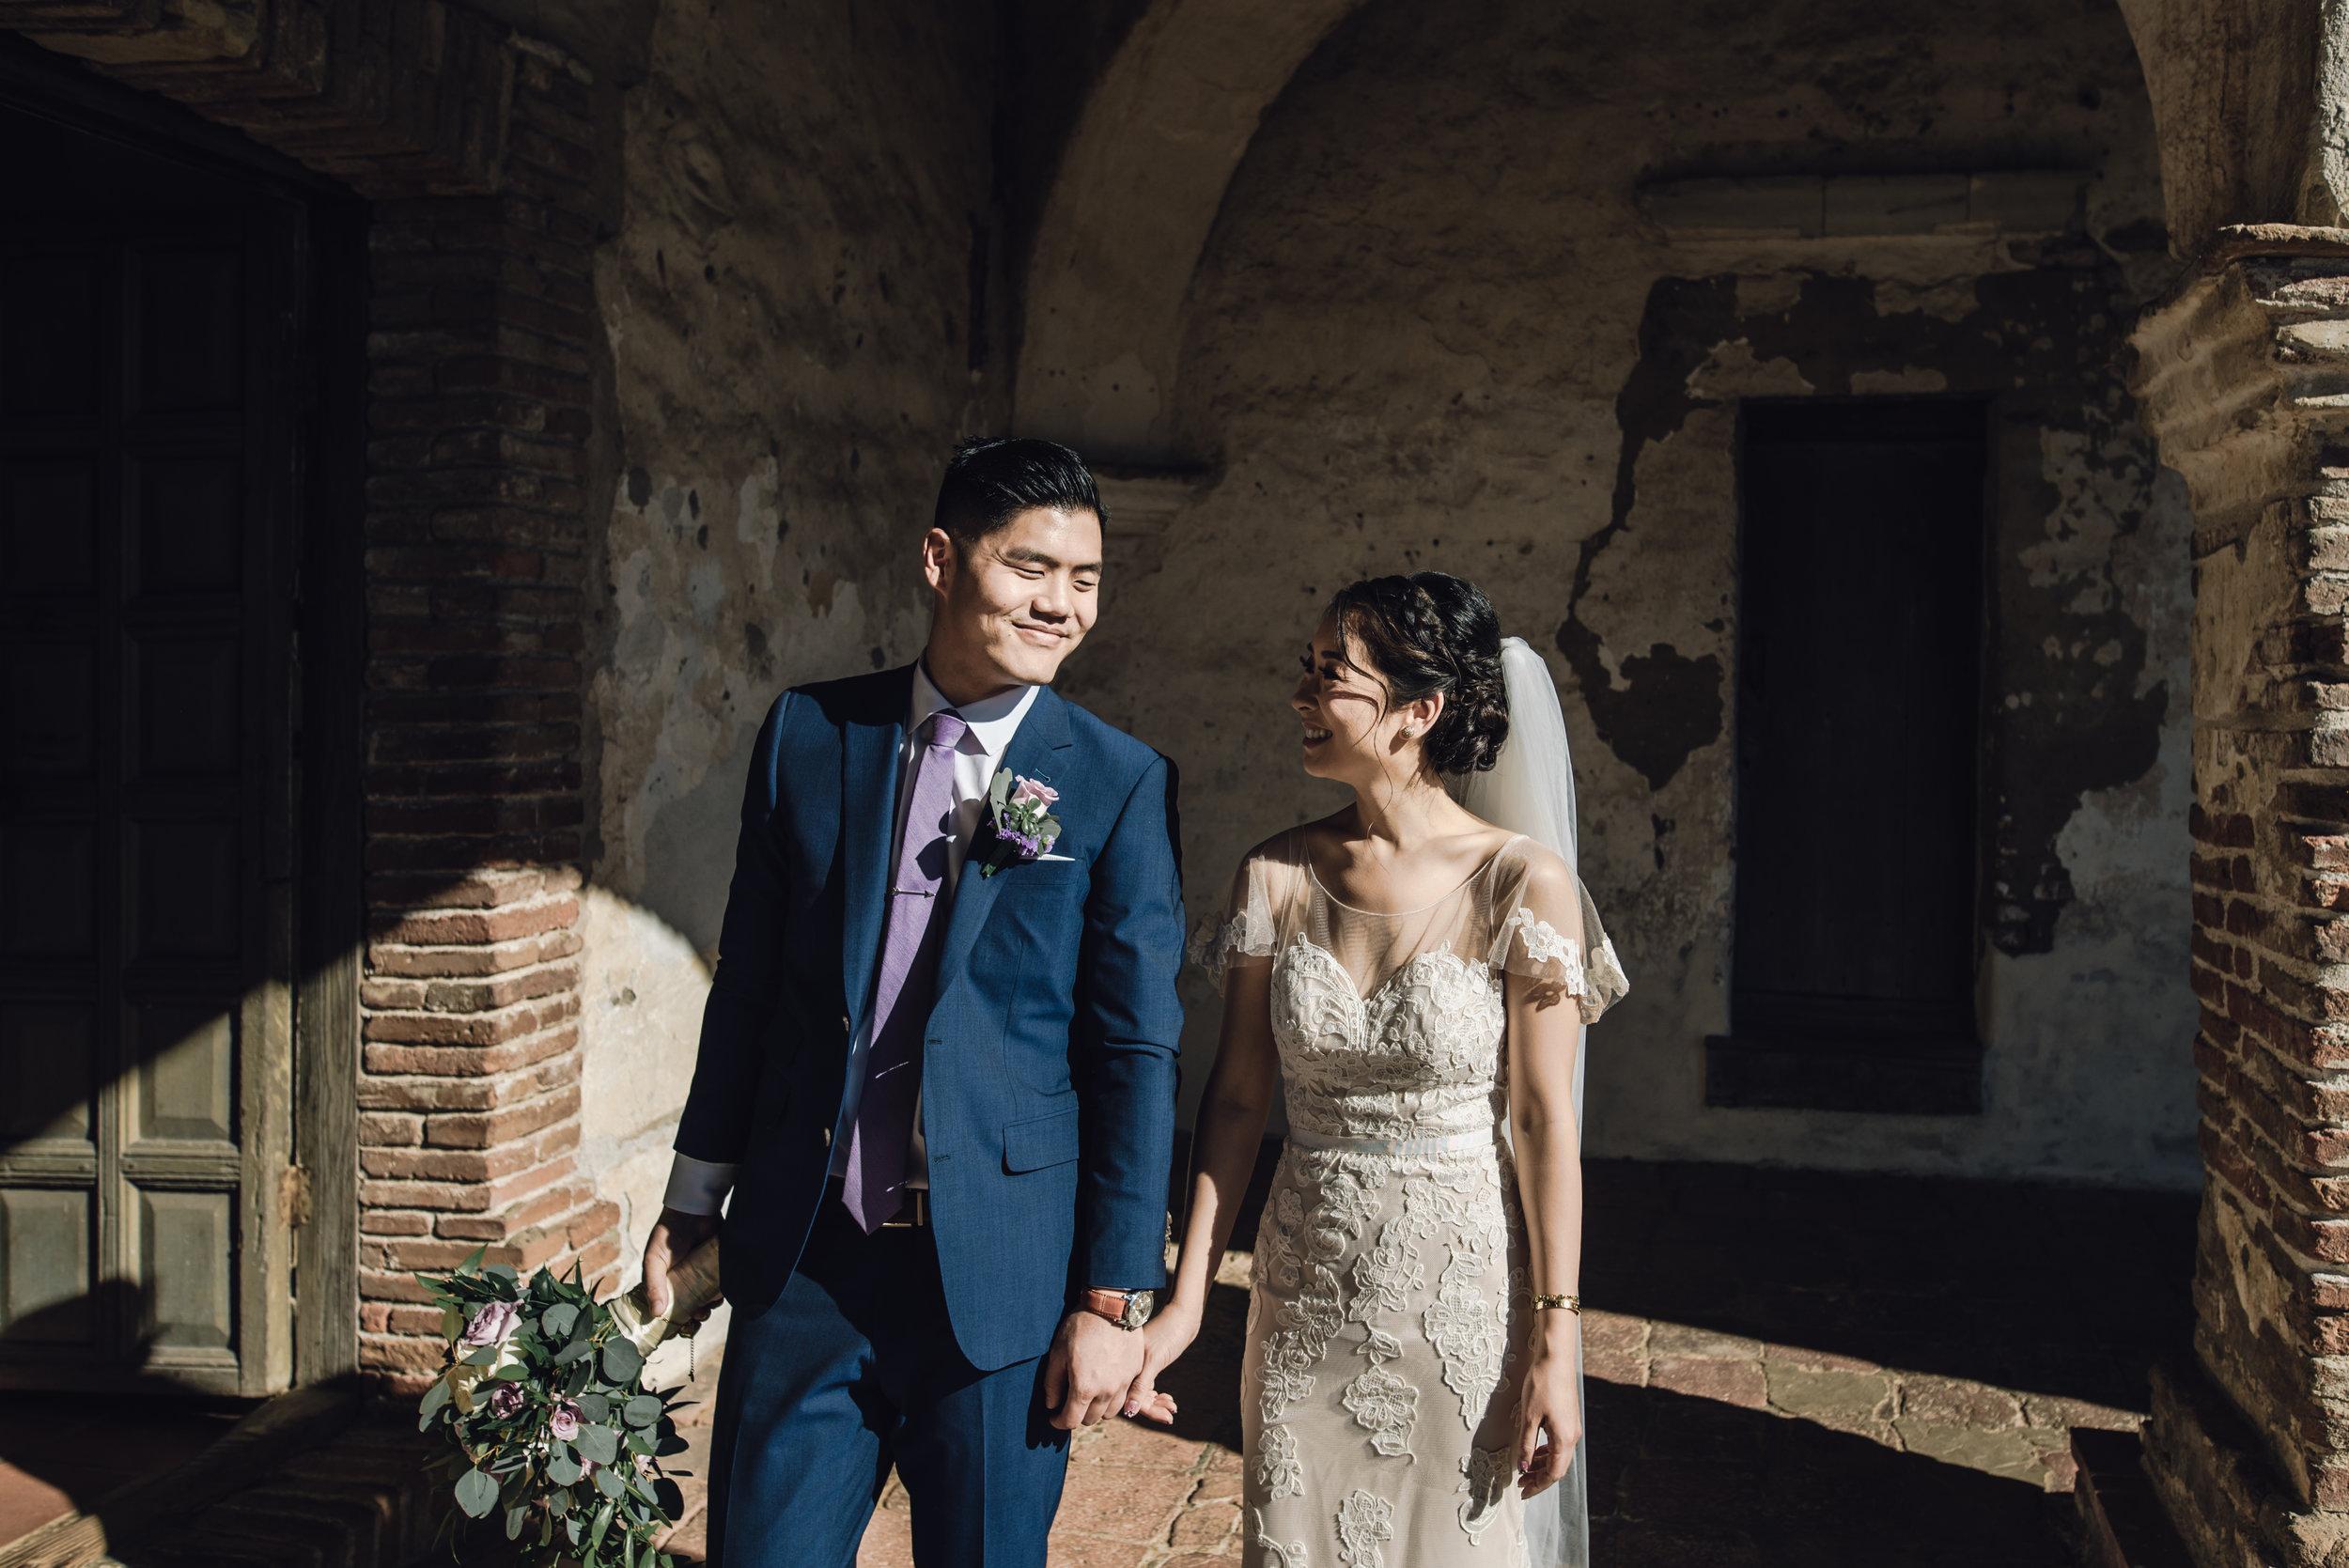 Main and Simple Photography_2017_Weddings_SanJuanCapistrano_J+B-398.jpg